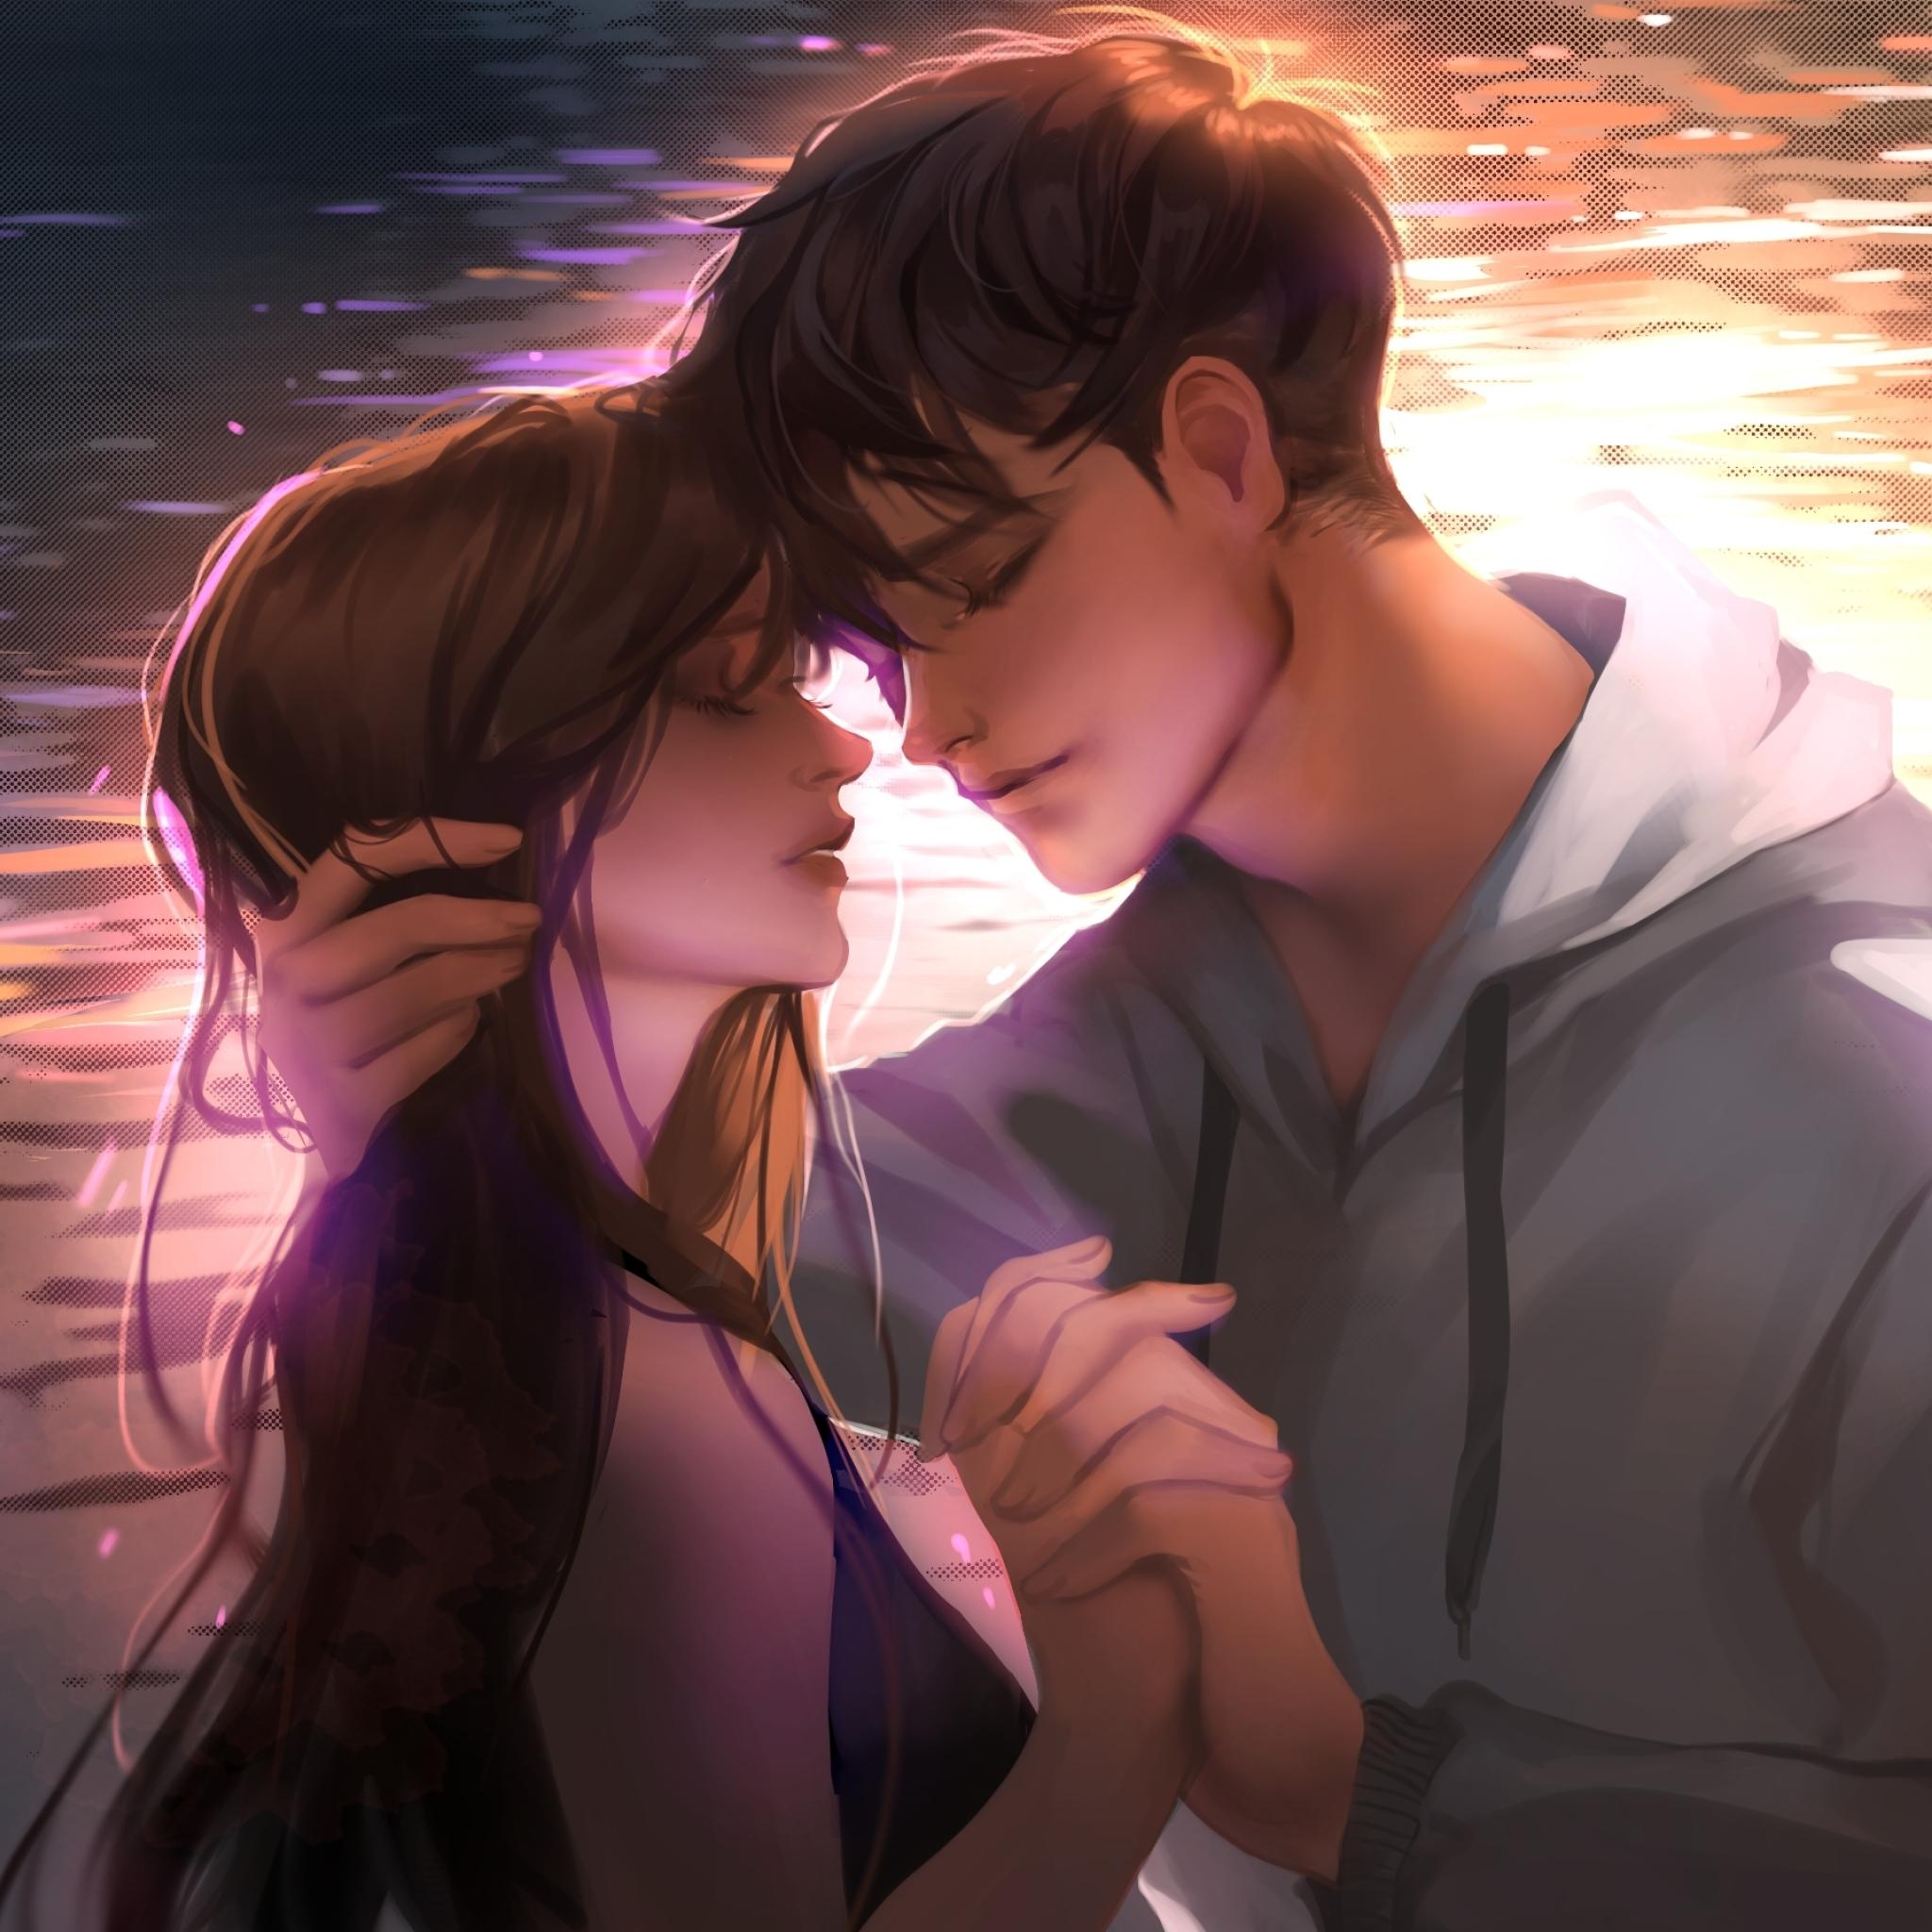 2048x2048 Anime Romantic Couple 2019 Ipad Air Wallpaper ...